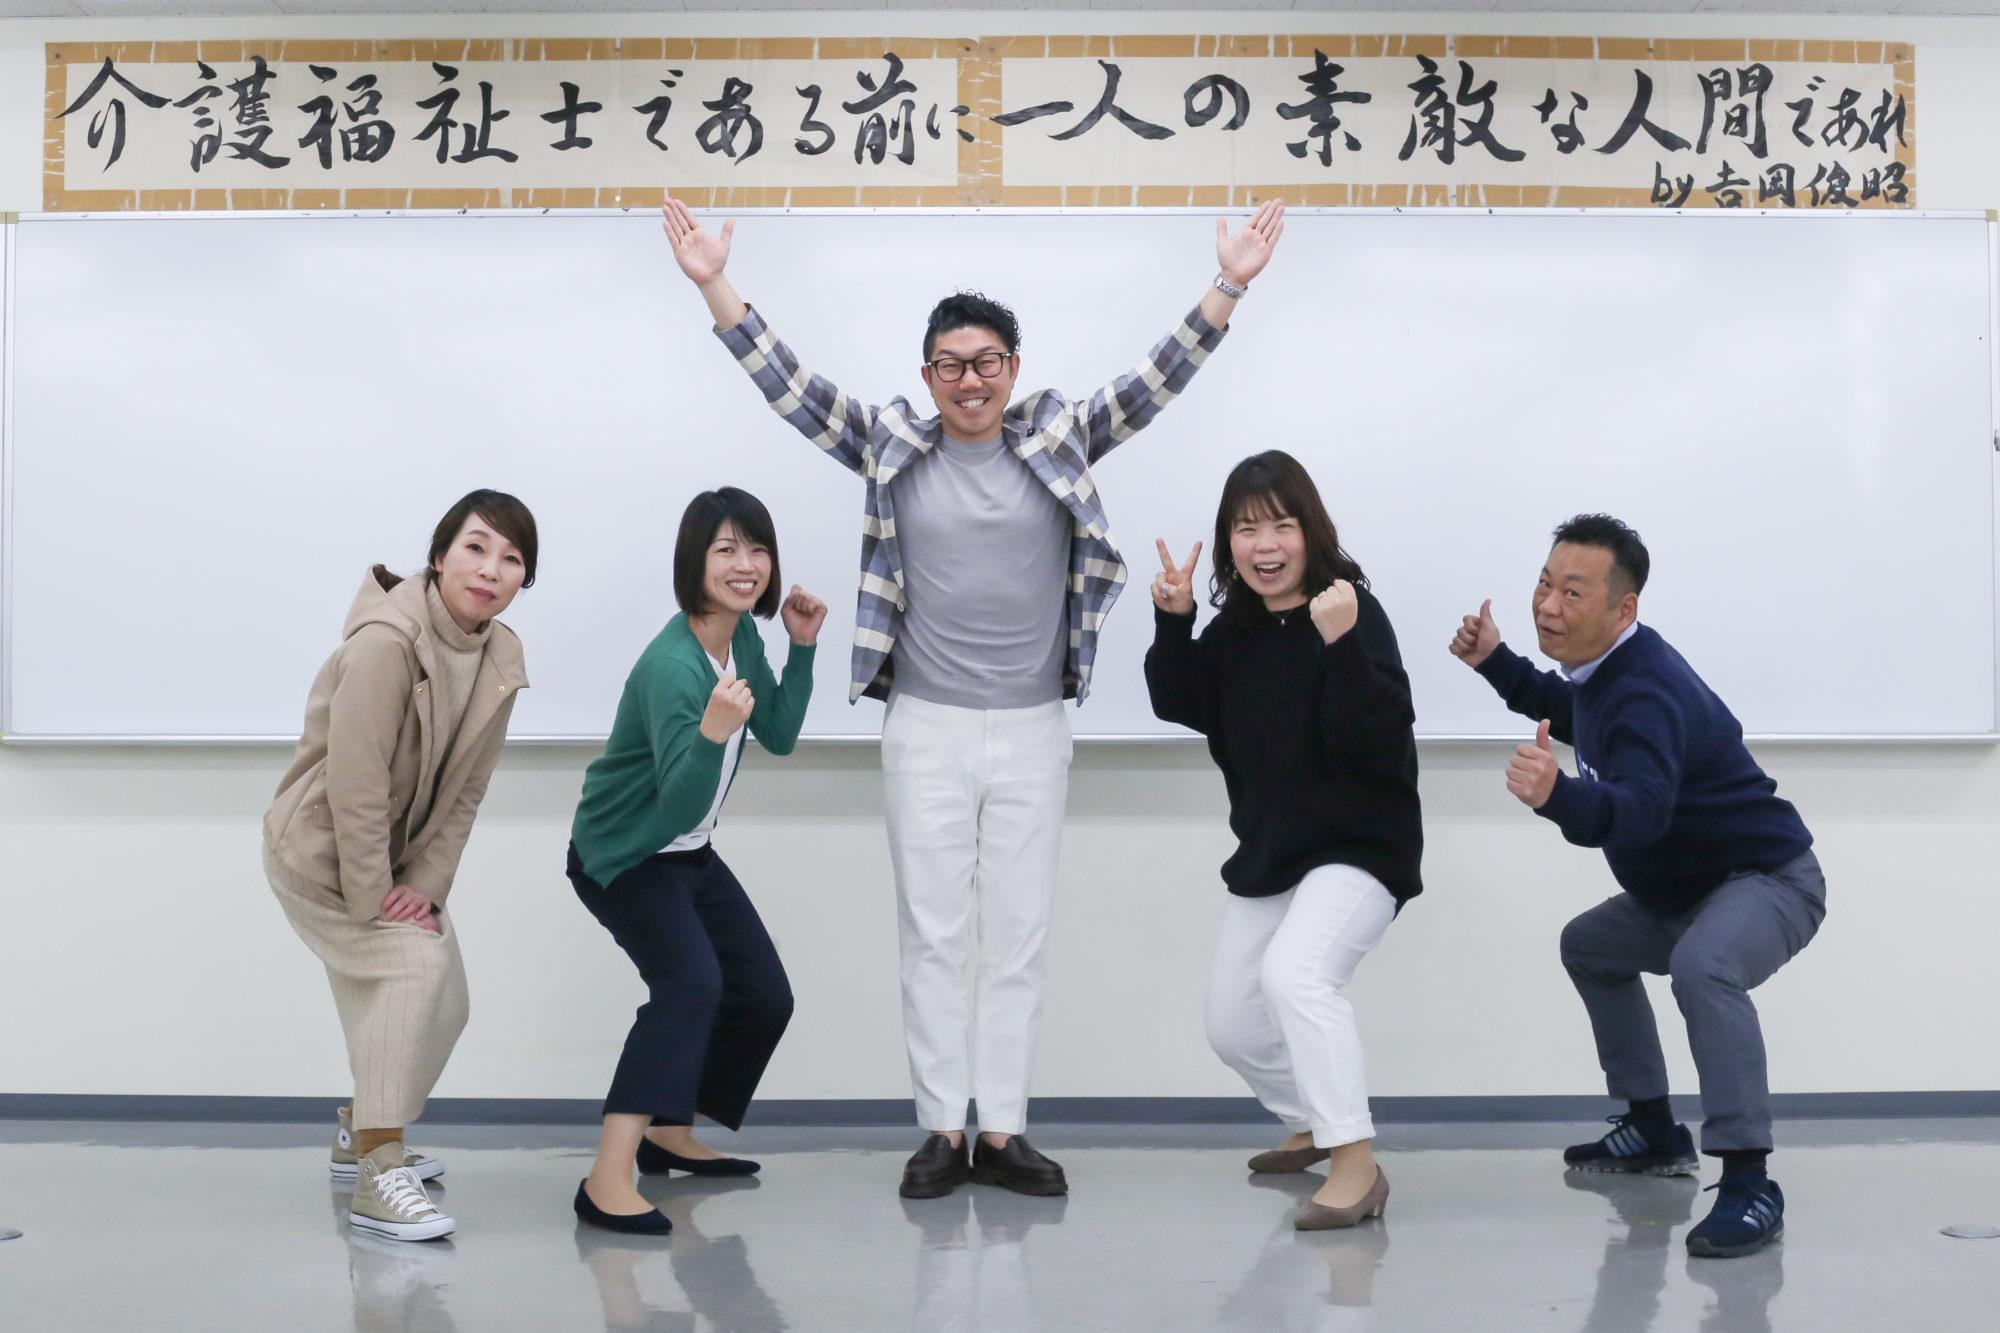 教員紹介 介護福祉学科メイン画像